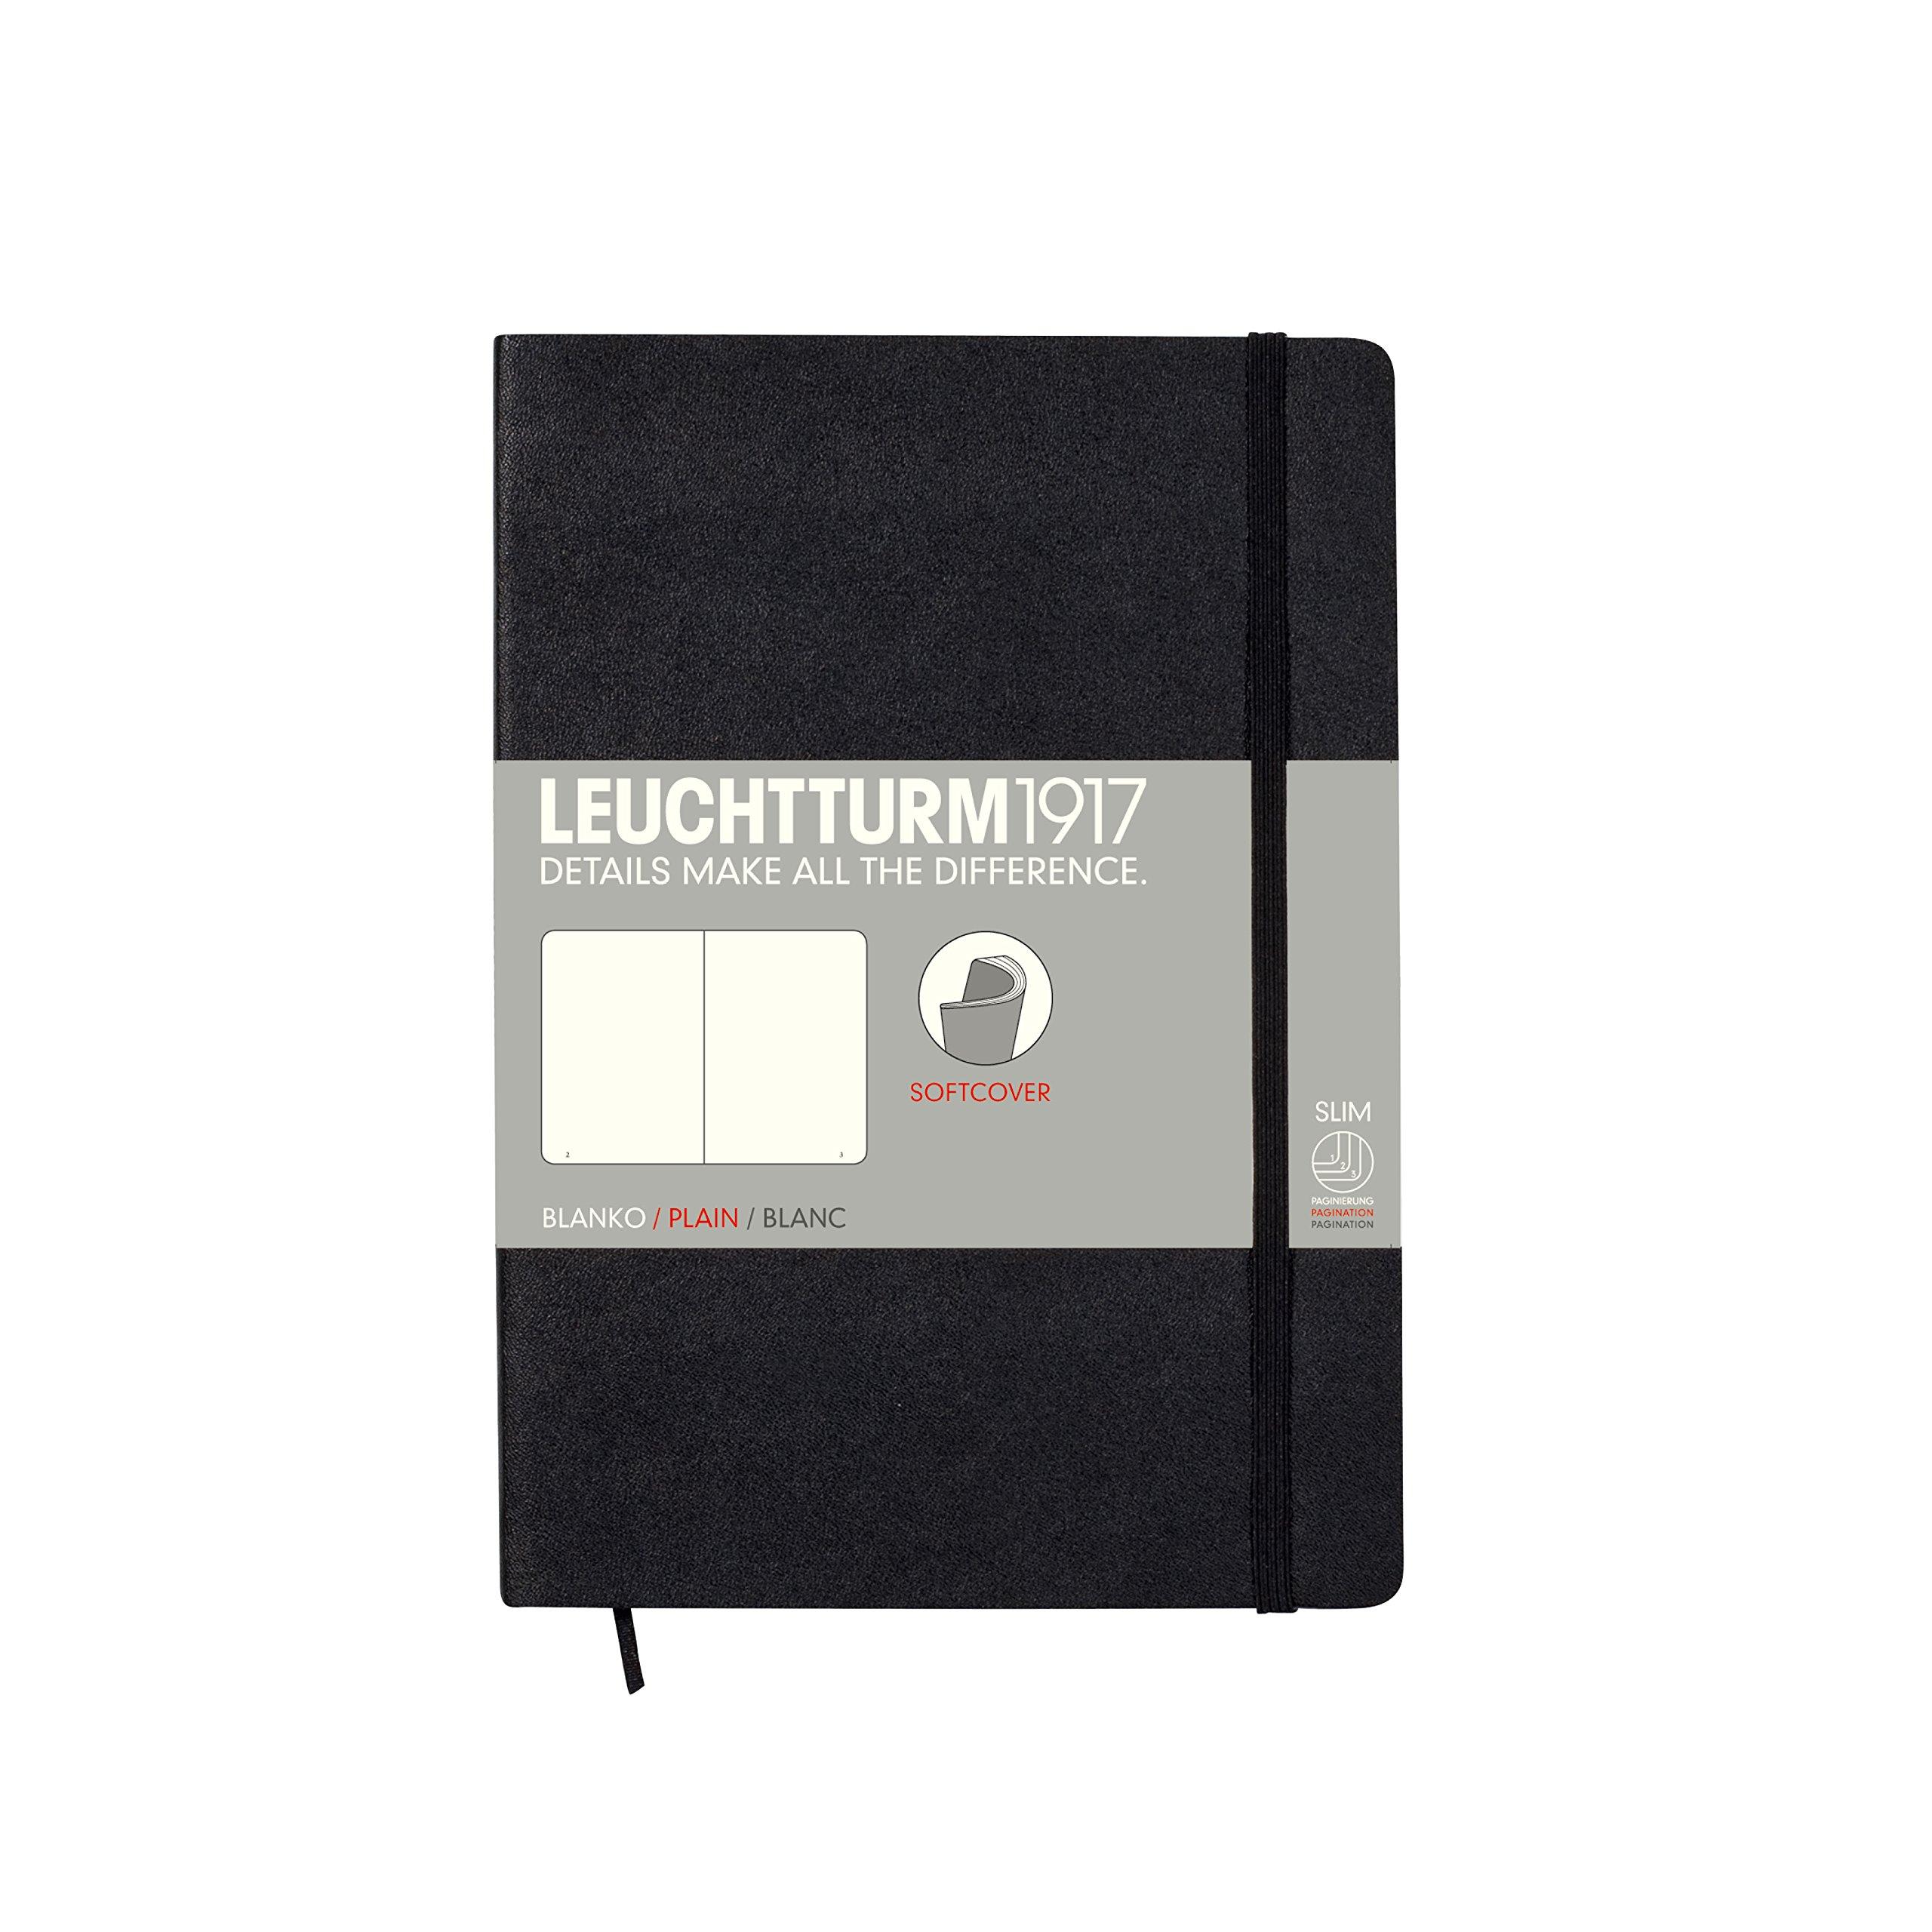 Leuchtturm1917 Medium Size B5 Softcover Notebook Plain Black by LEUCHTTURM1917 (Image #7)